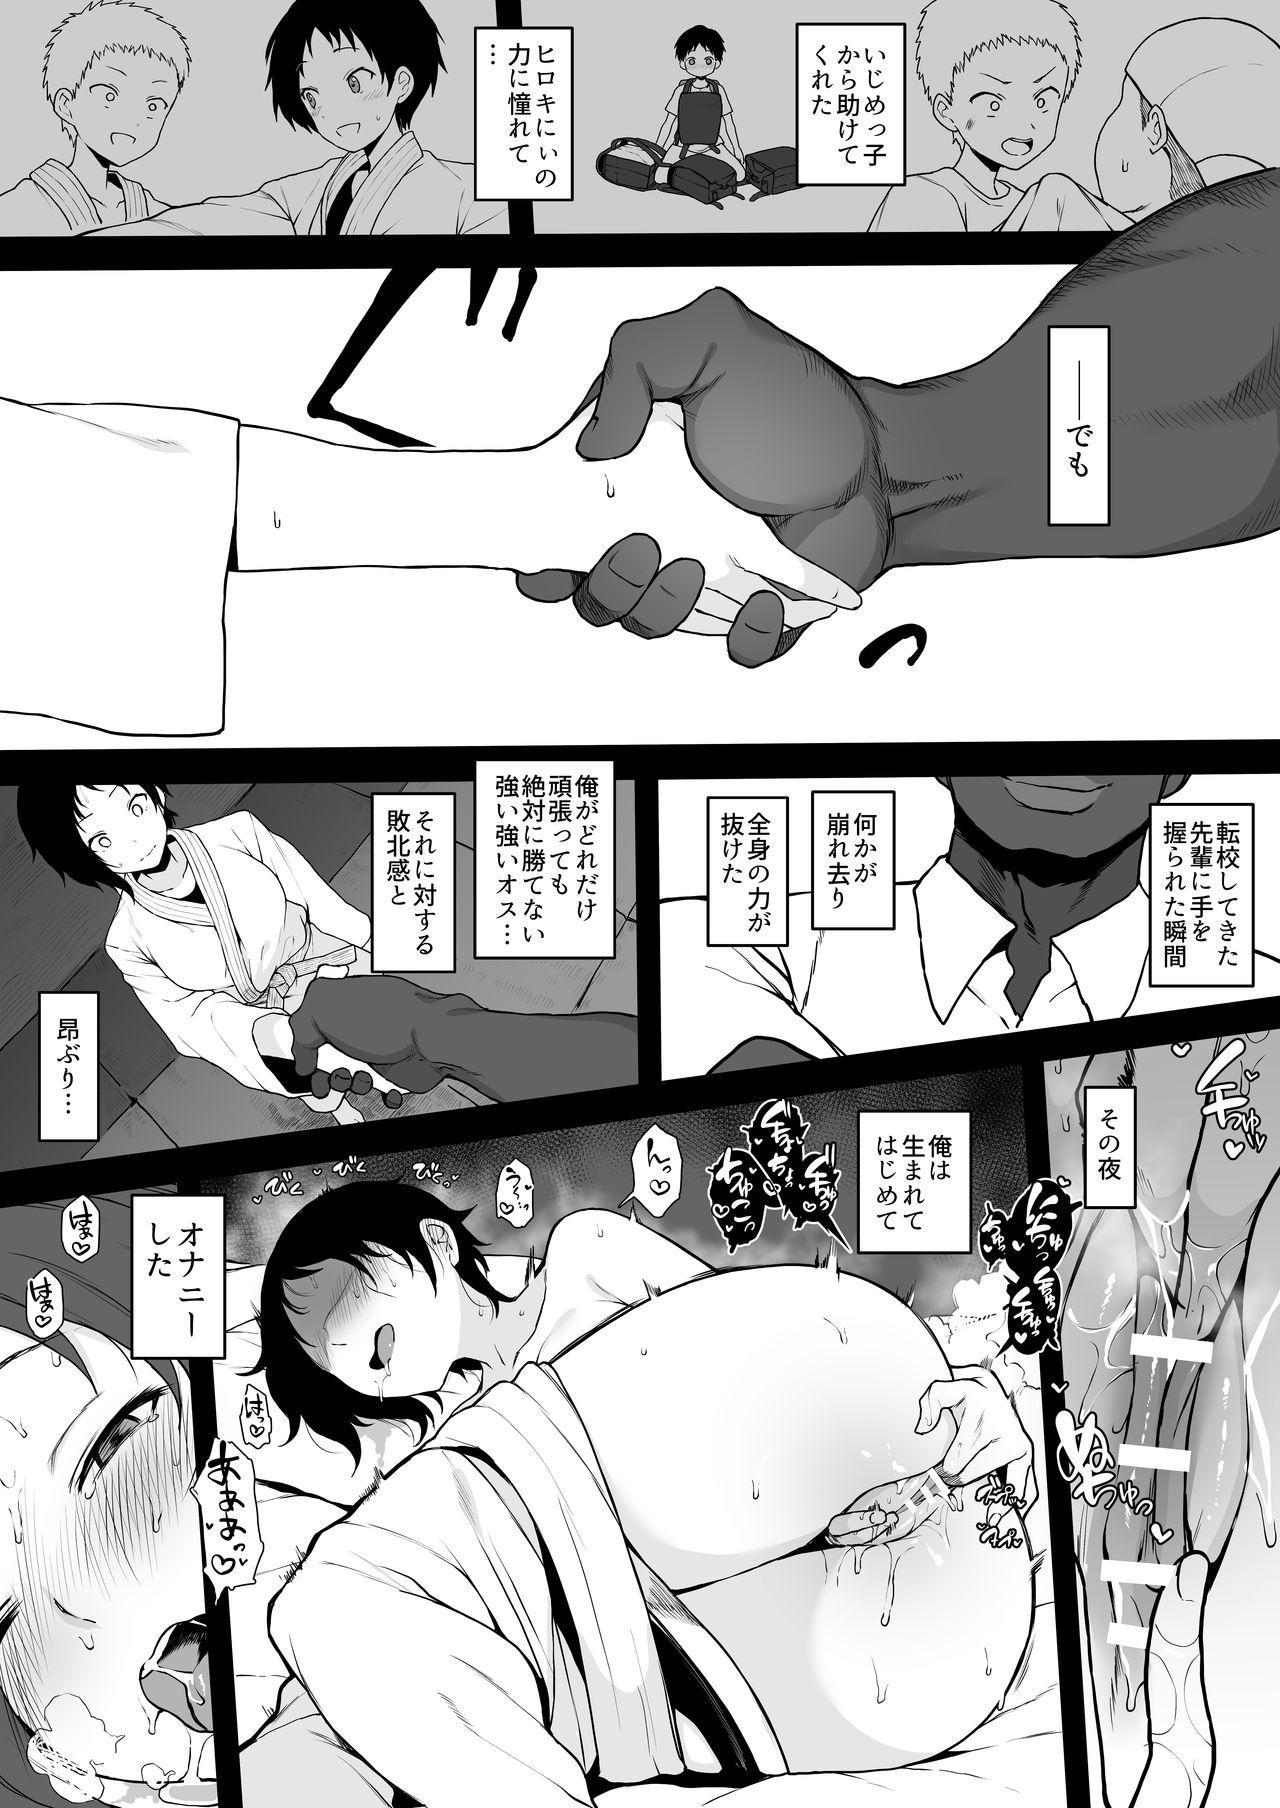 [Terasu MC] Kokujin no Tenkousei NTR ru (5) Kouhai o NTR ru 7